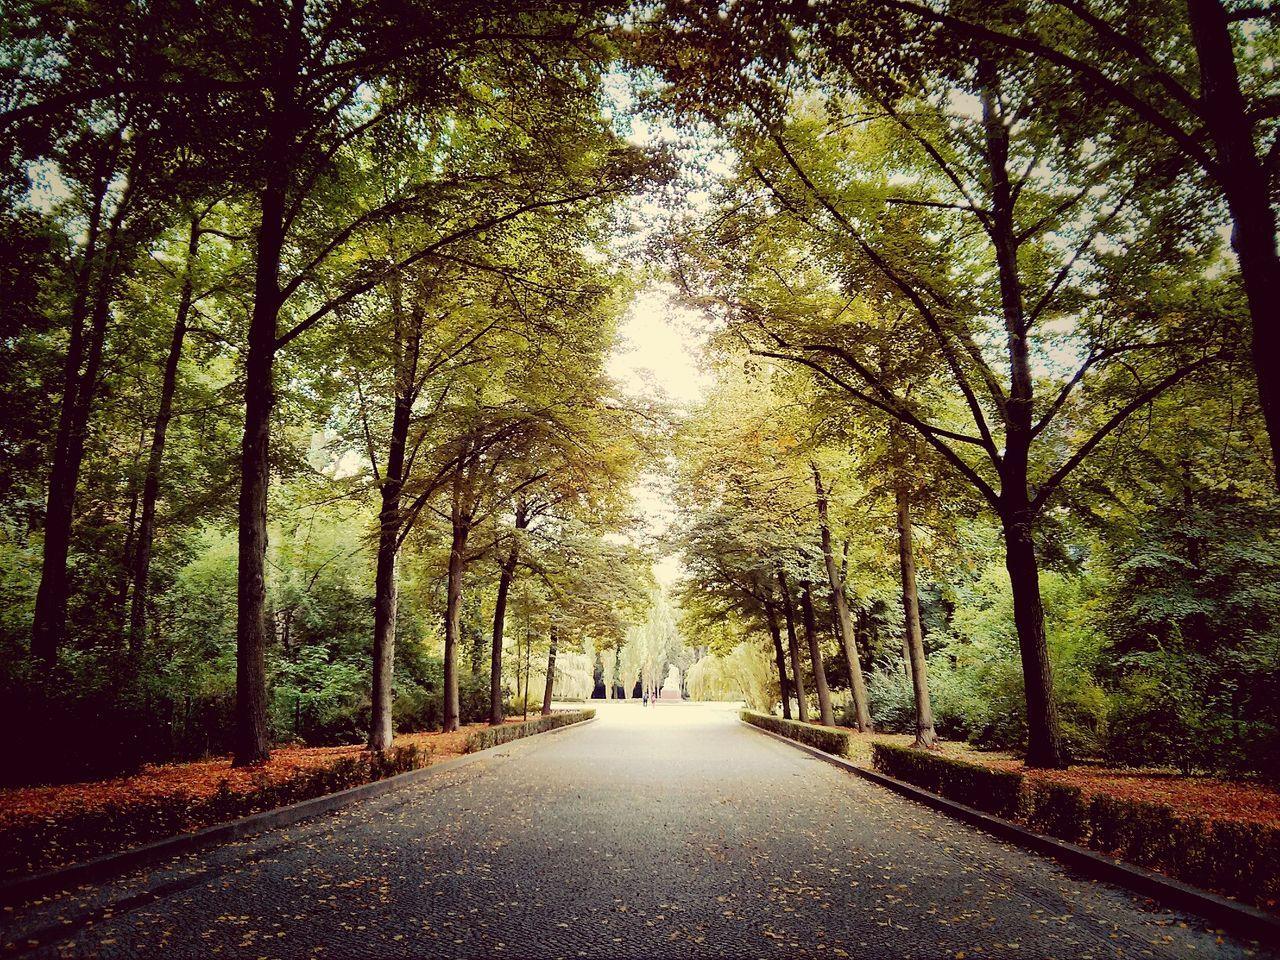 Scenic shot of treelined empty road